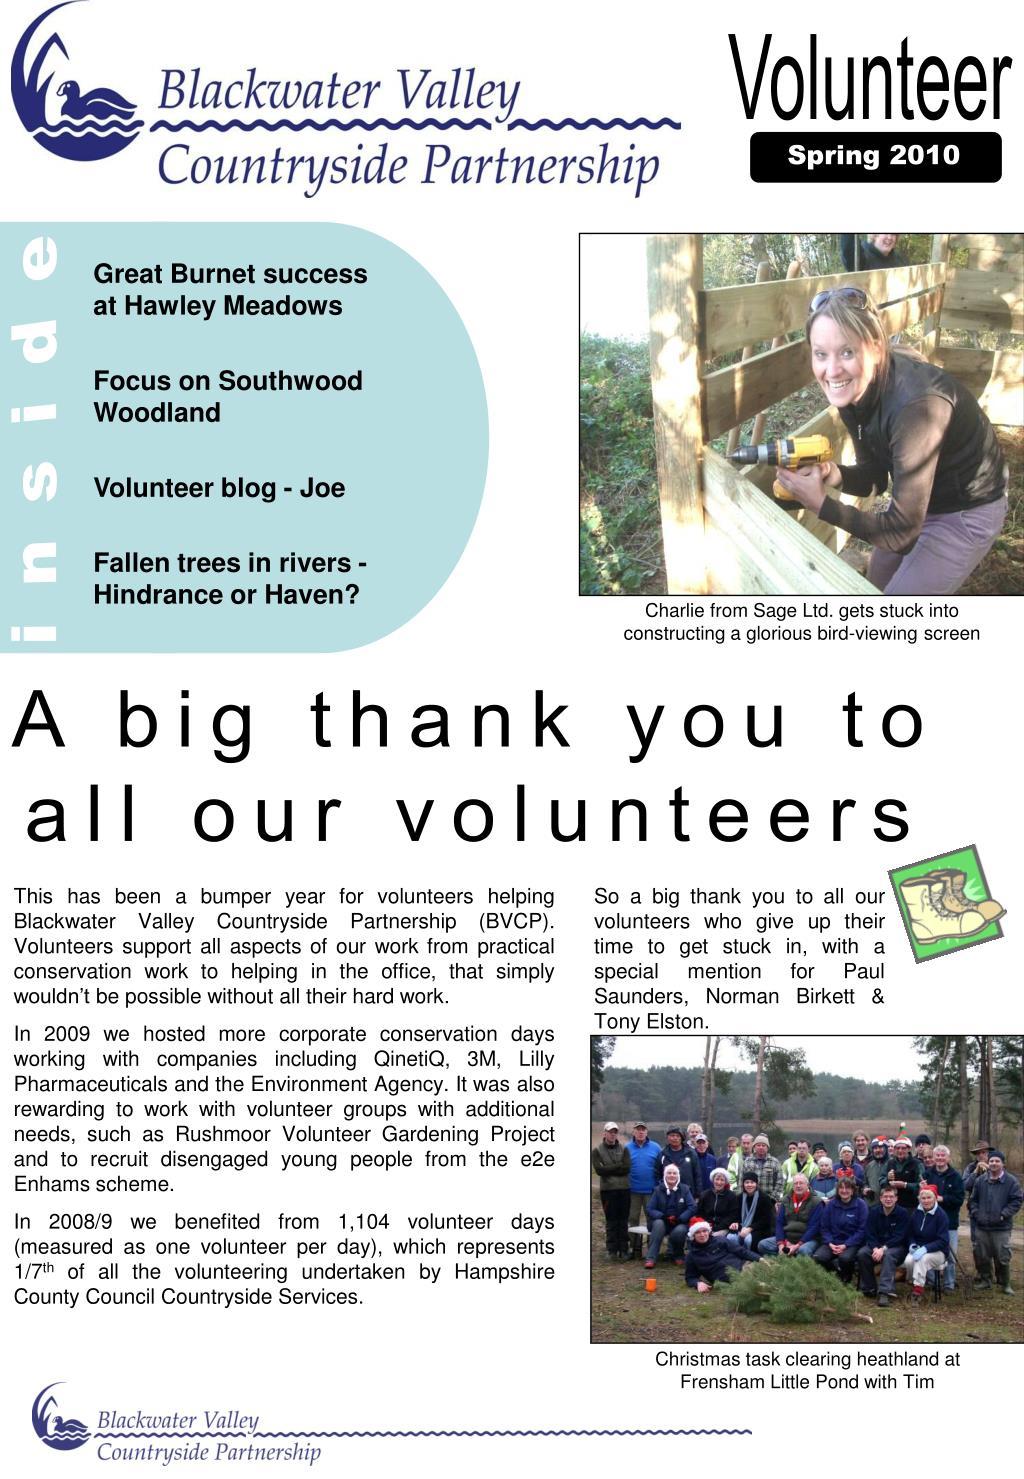 Great Burnet success at Hawley Meadows